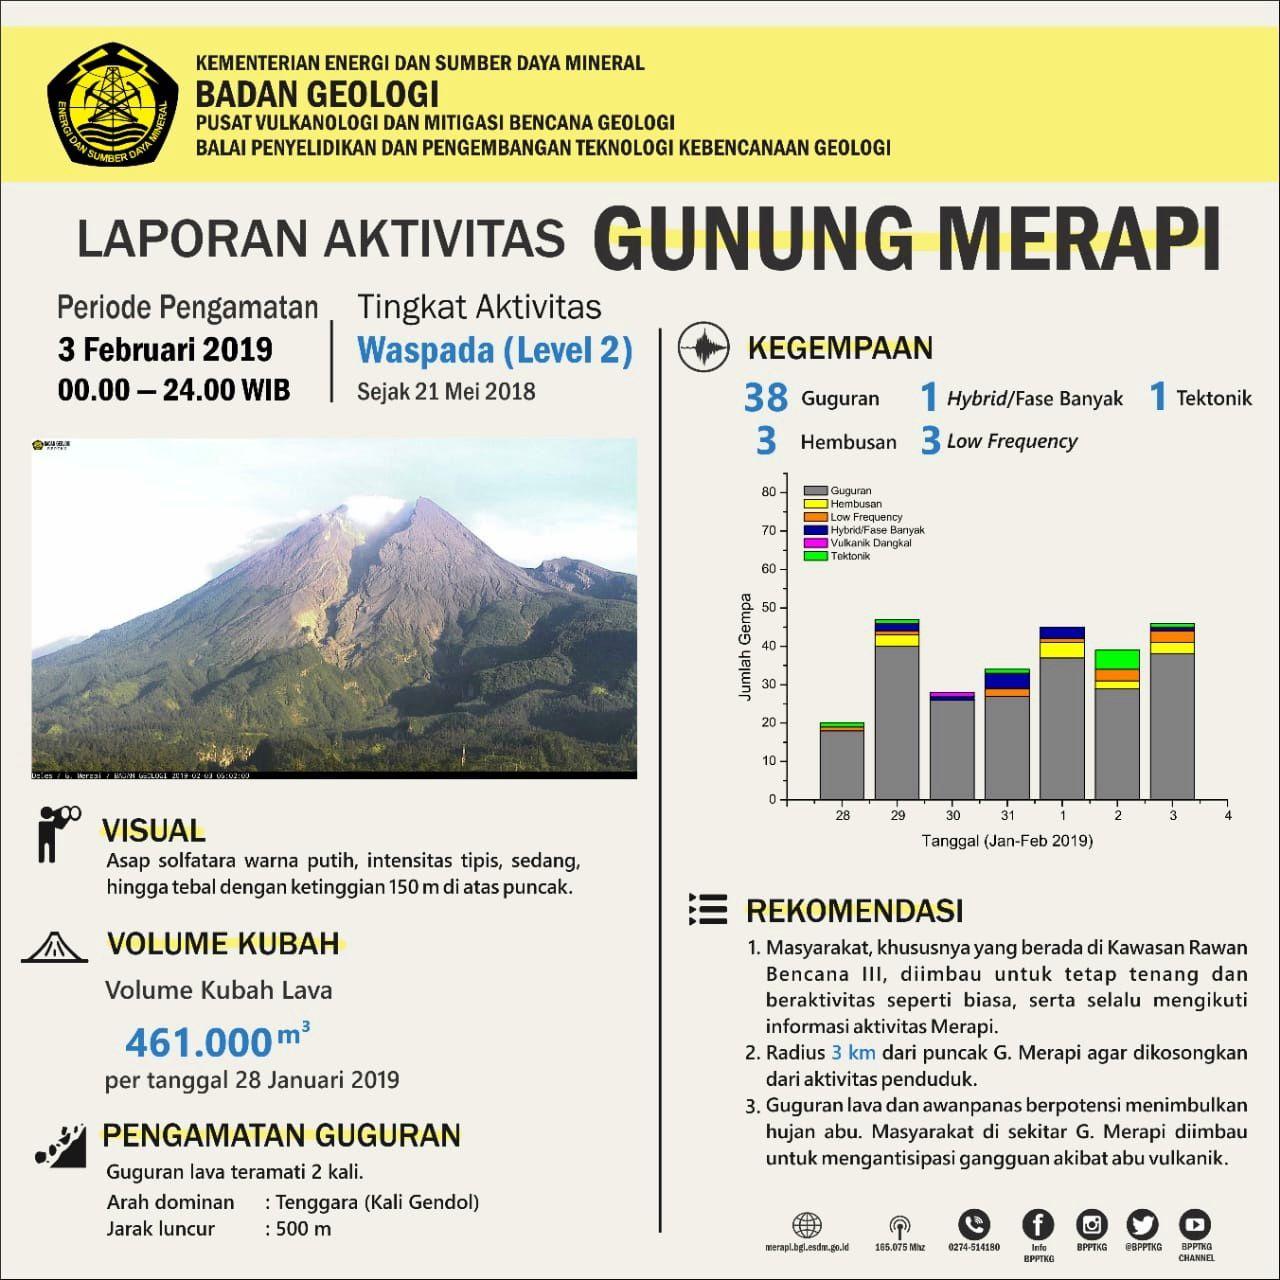 Merapi - Activity table of 03.02.2019 - BPTKG